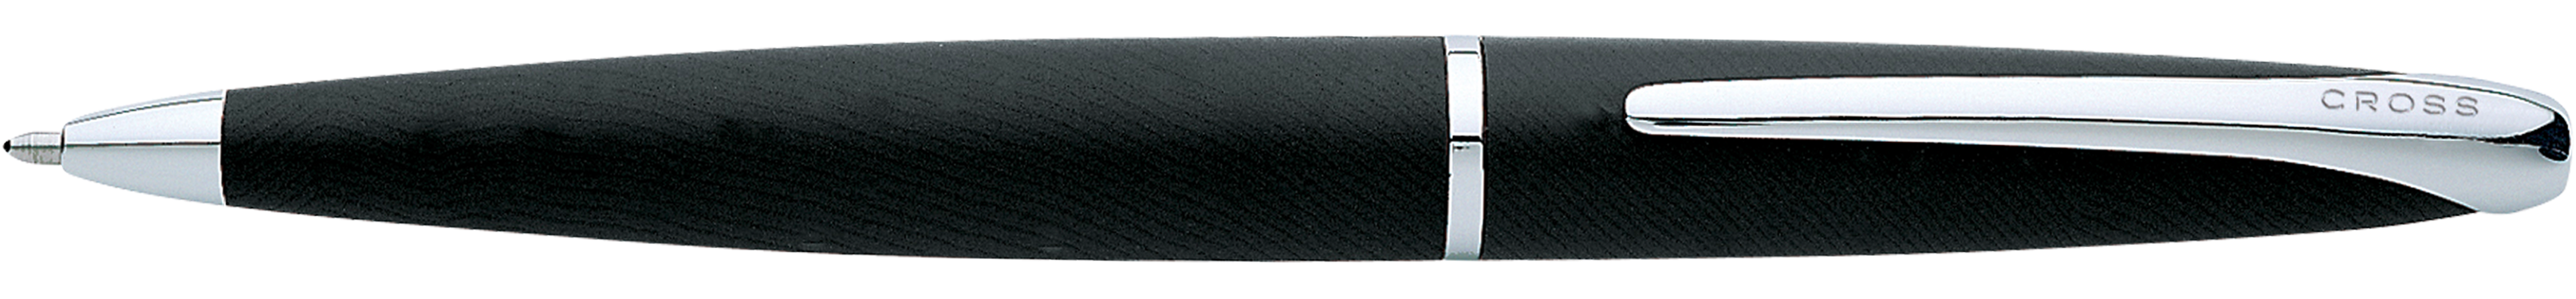 ATX Basalt Black Ballpoint Pen